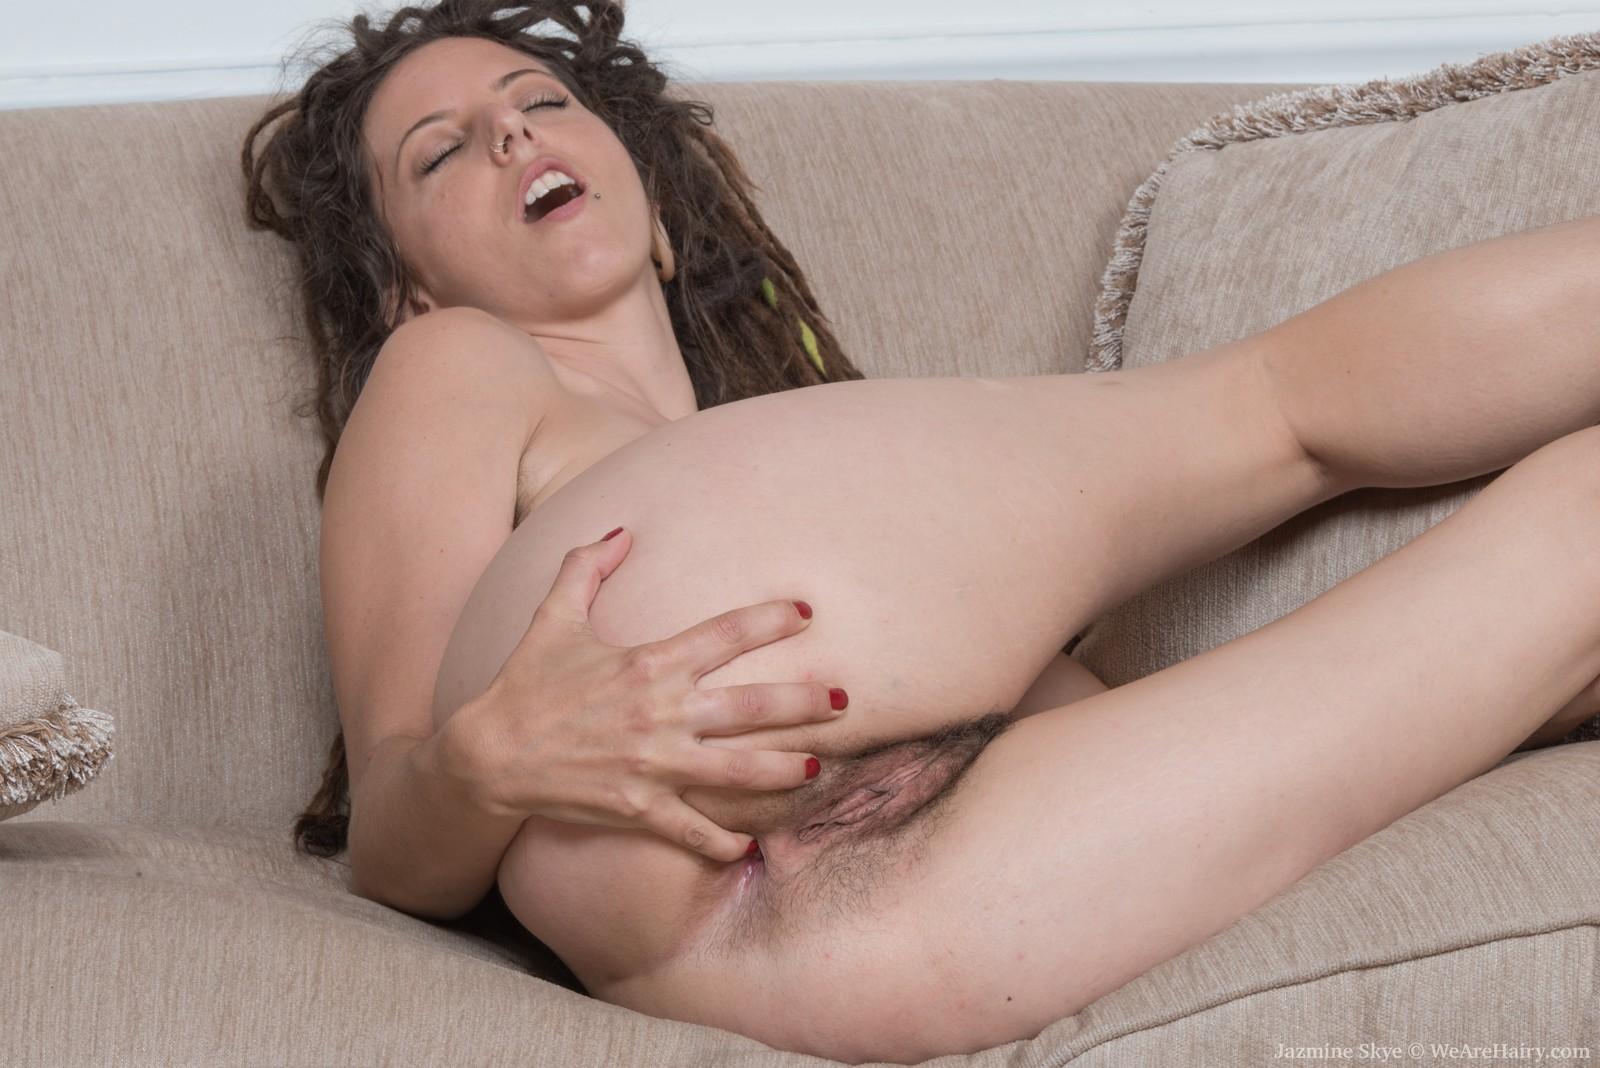 Big boob jaya prada actress fuck video